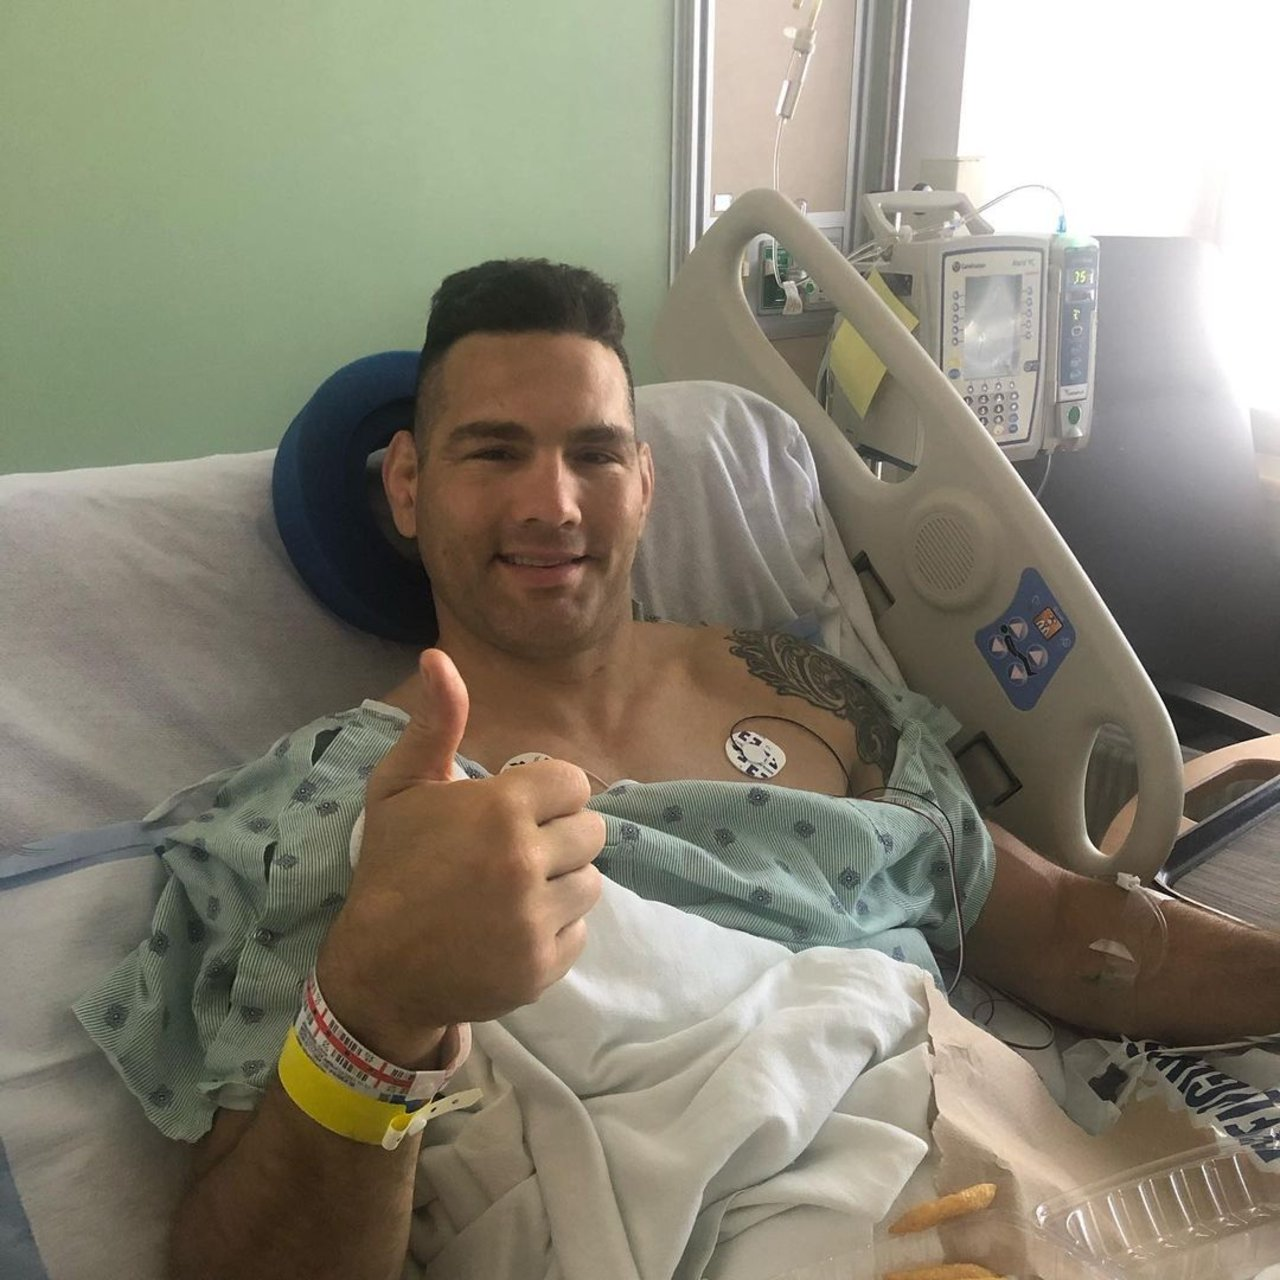 Chris Weidman lesión ufc 261 cirugia pierna rota